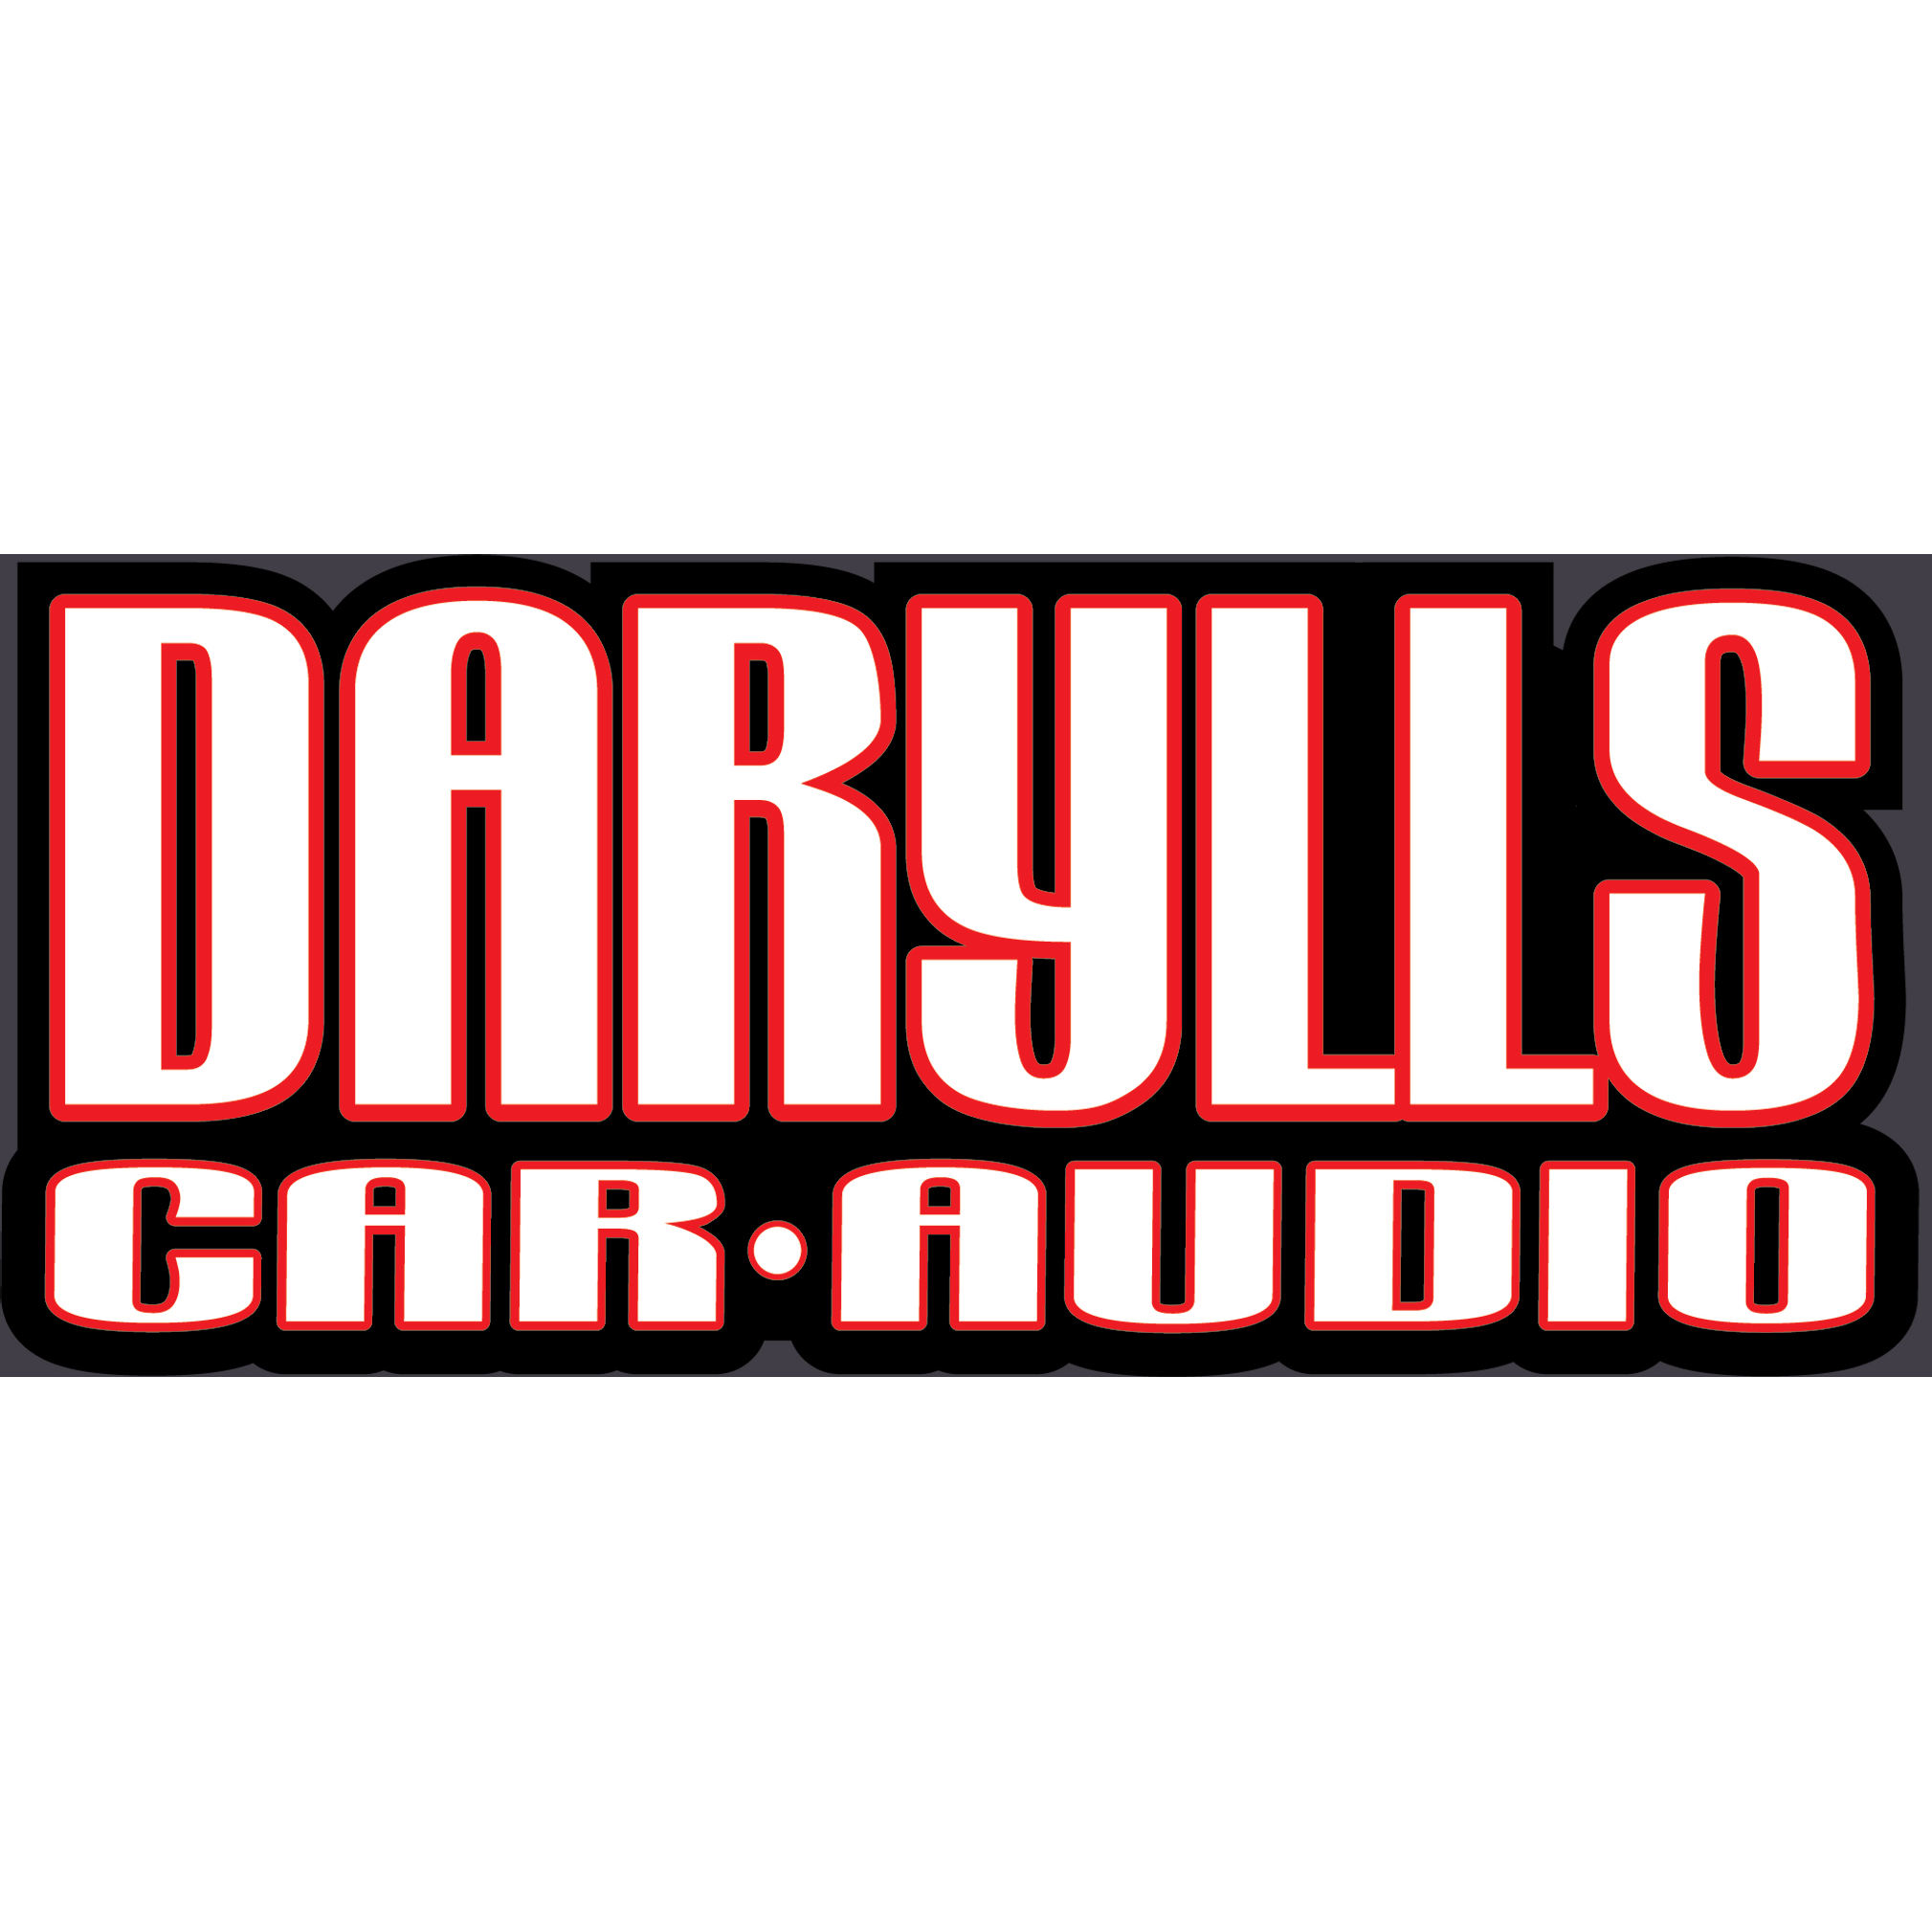 Darylls Car Audio image 4